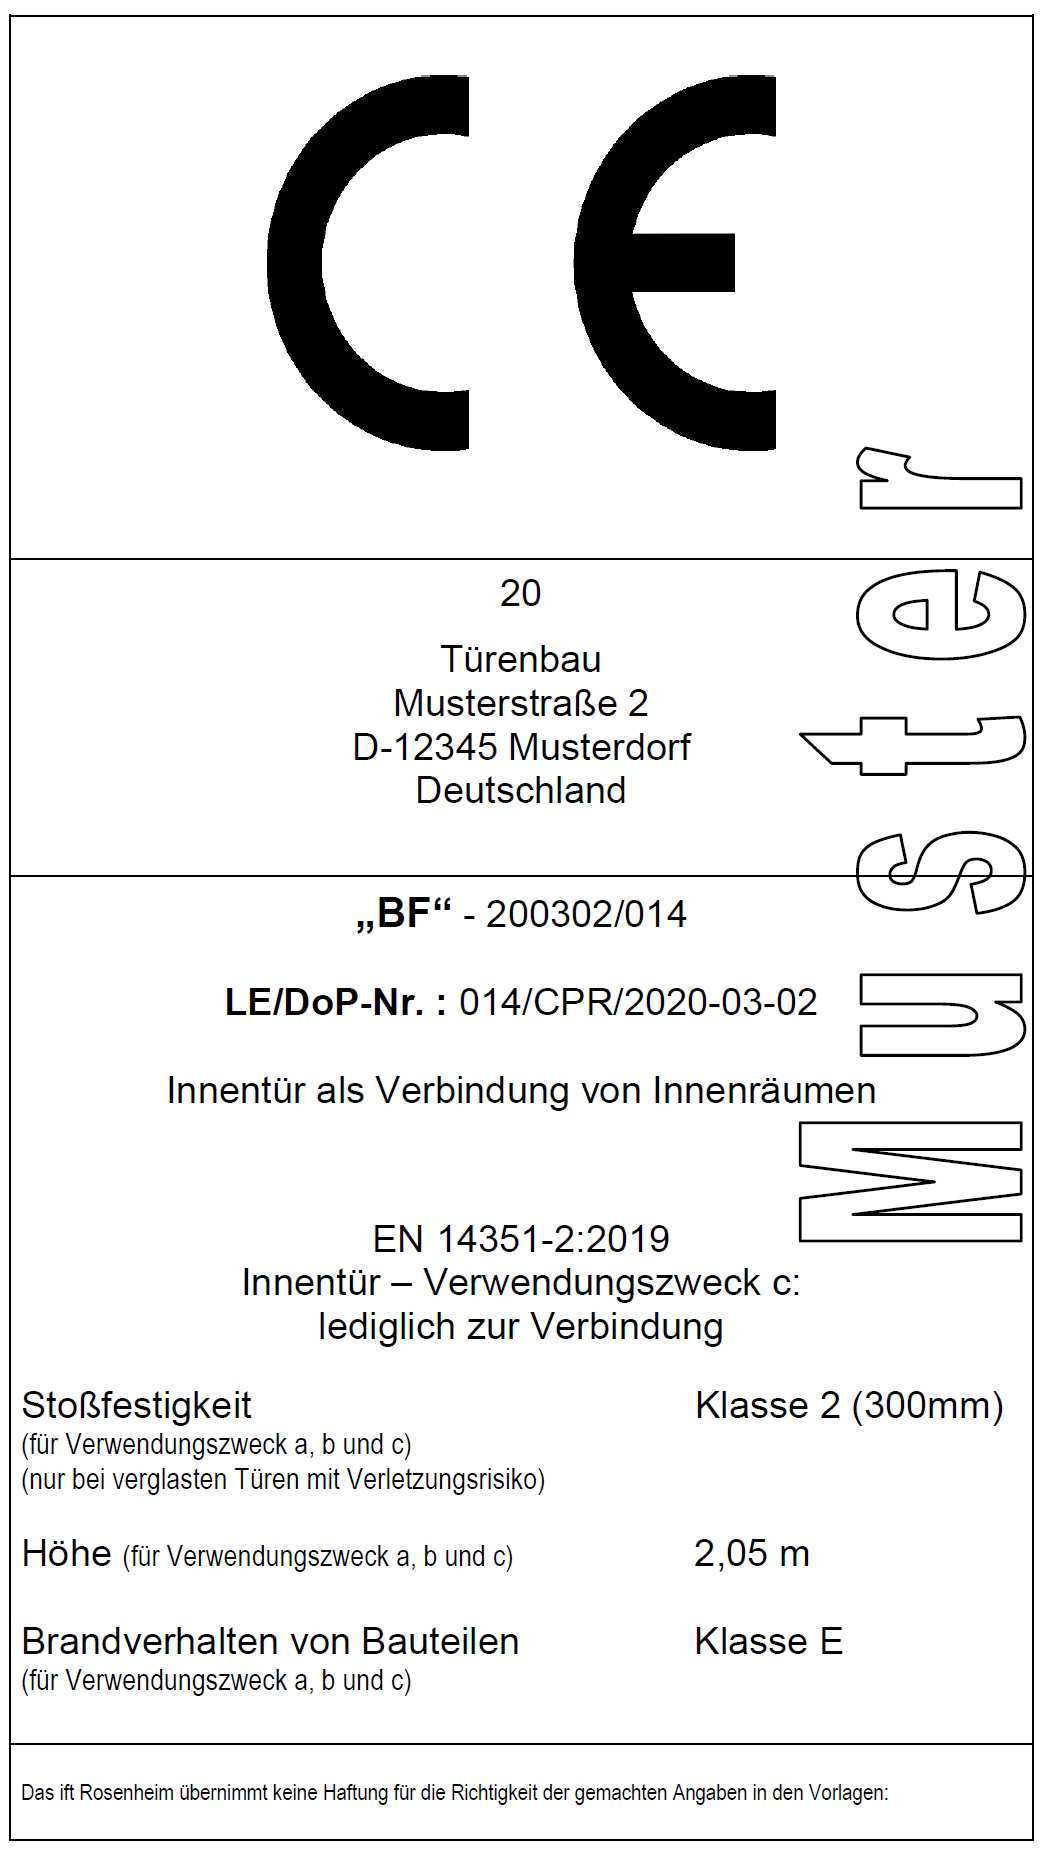 Din En 14351 2 Erste Praxistipps Zur Umsetzung Bs Brandschutz